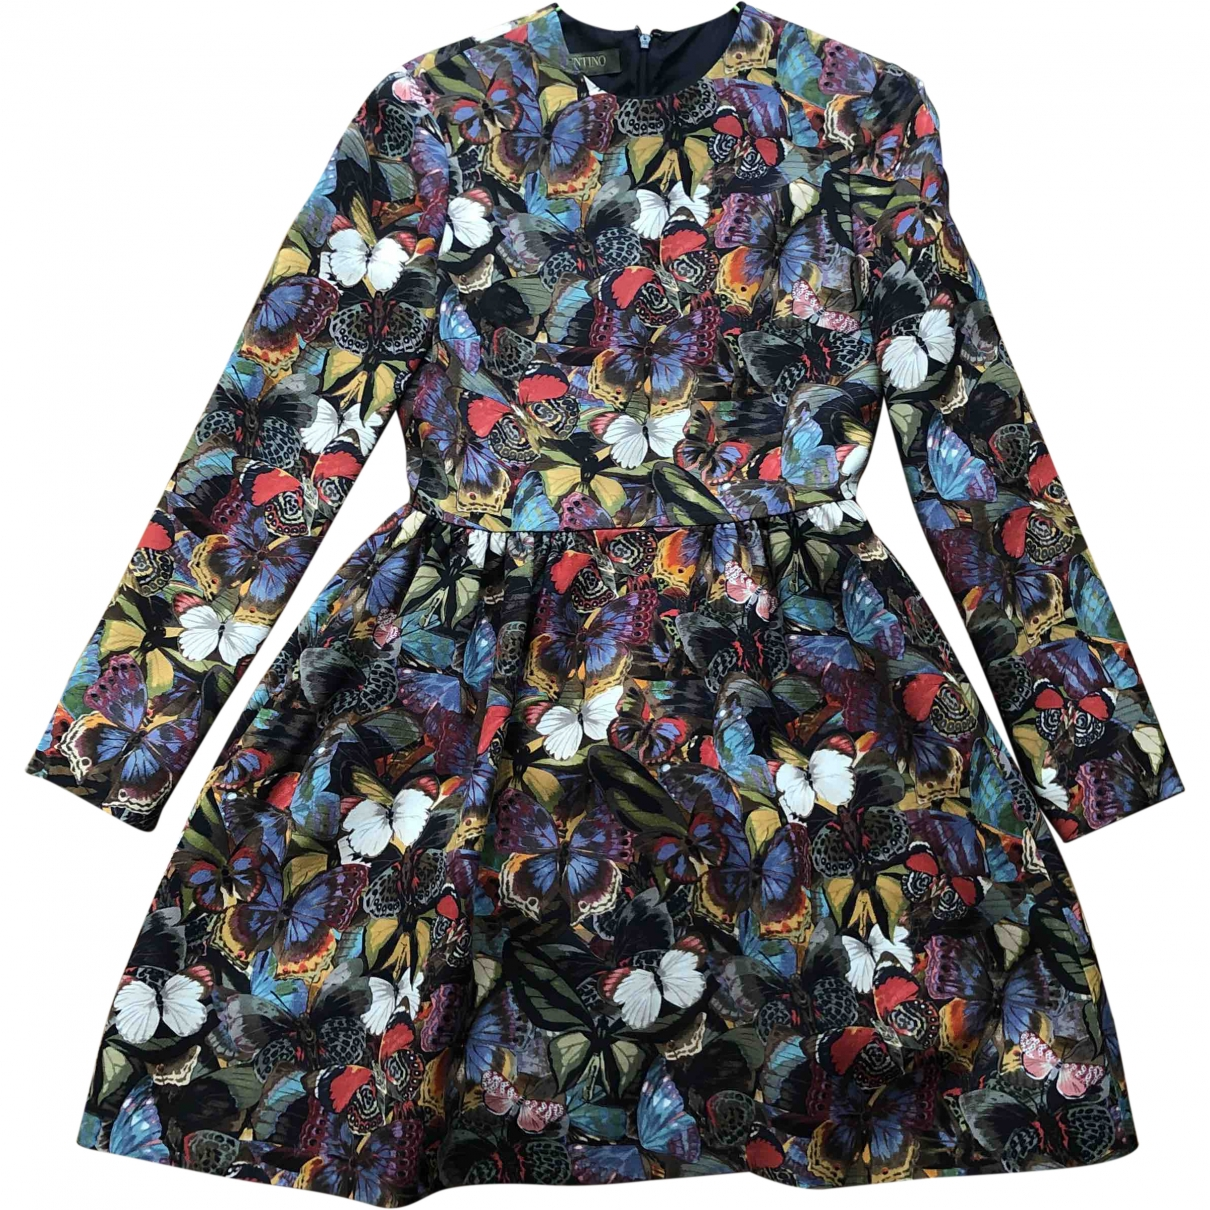 Valentino Garavani \N Multicolour Wool dress for Women 38 IT